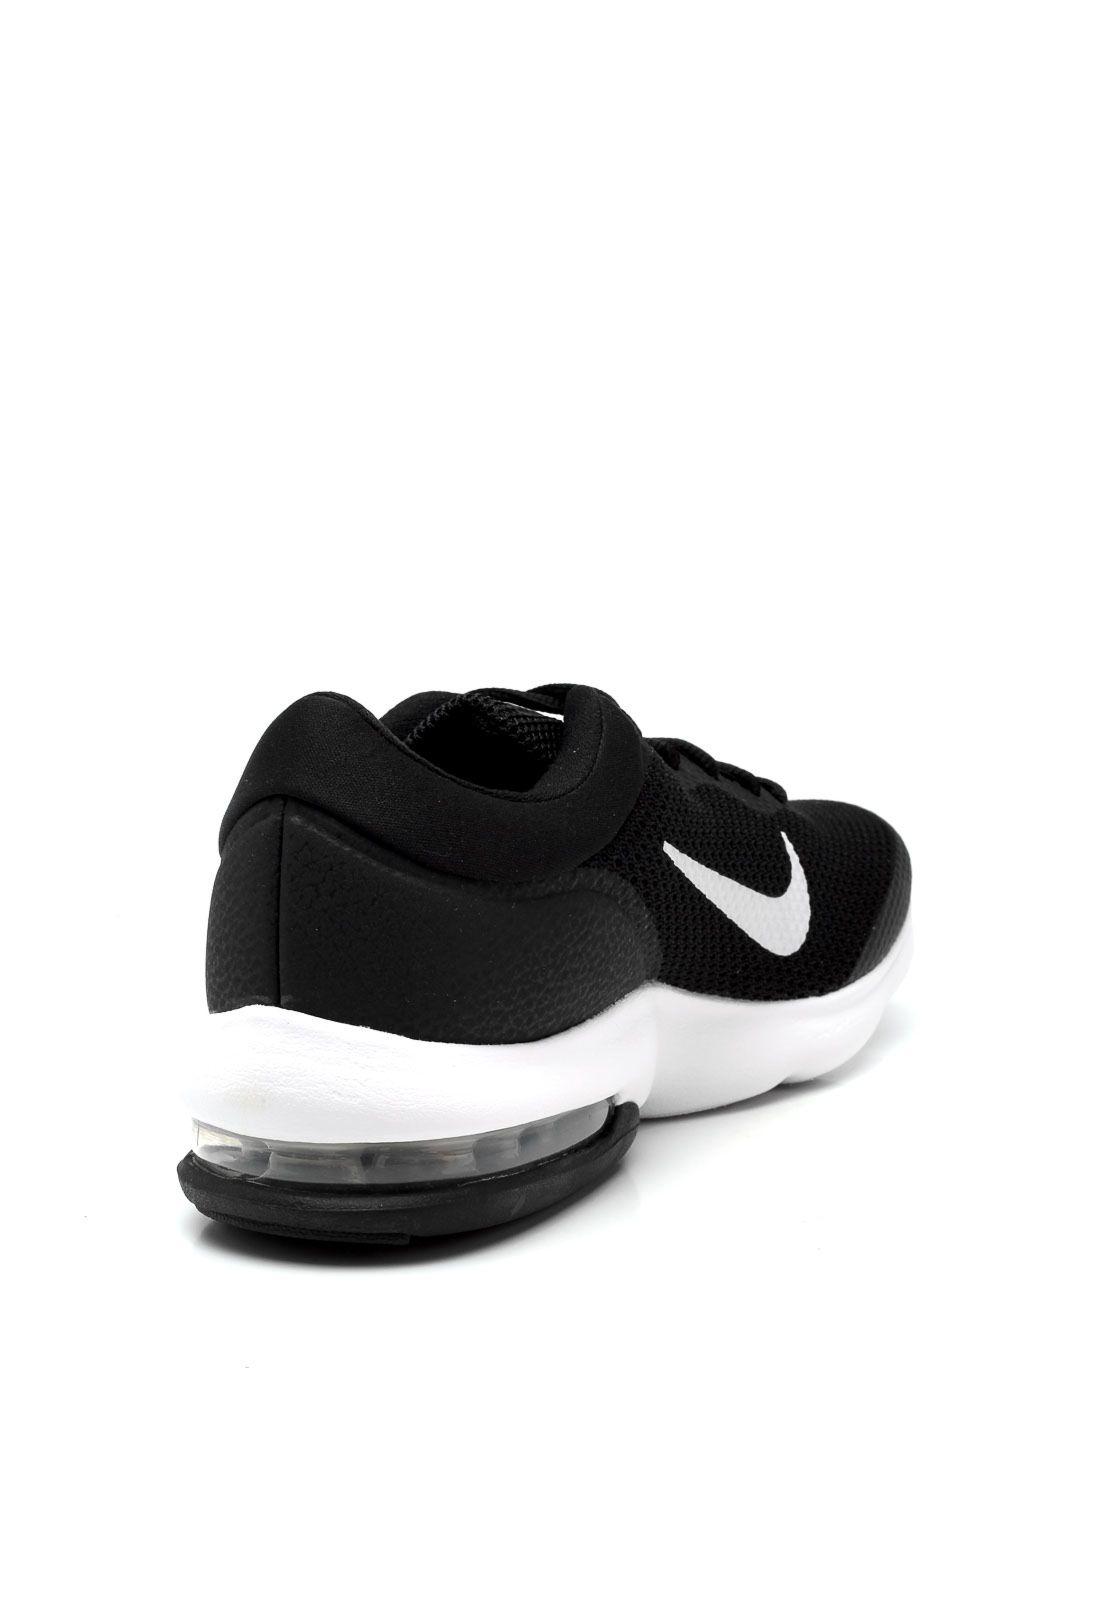 9ea9bad2f3 Tênis Corrida Nike Air Max Advantage Preto Branco